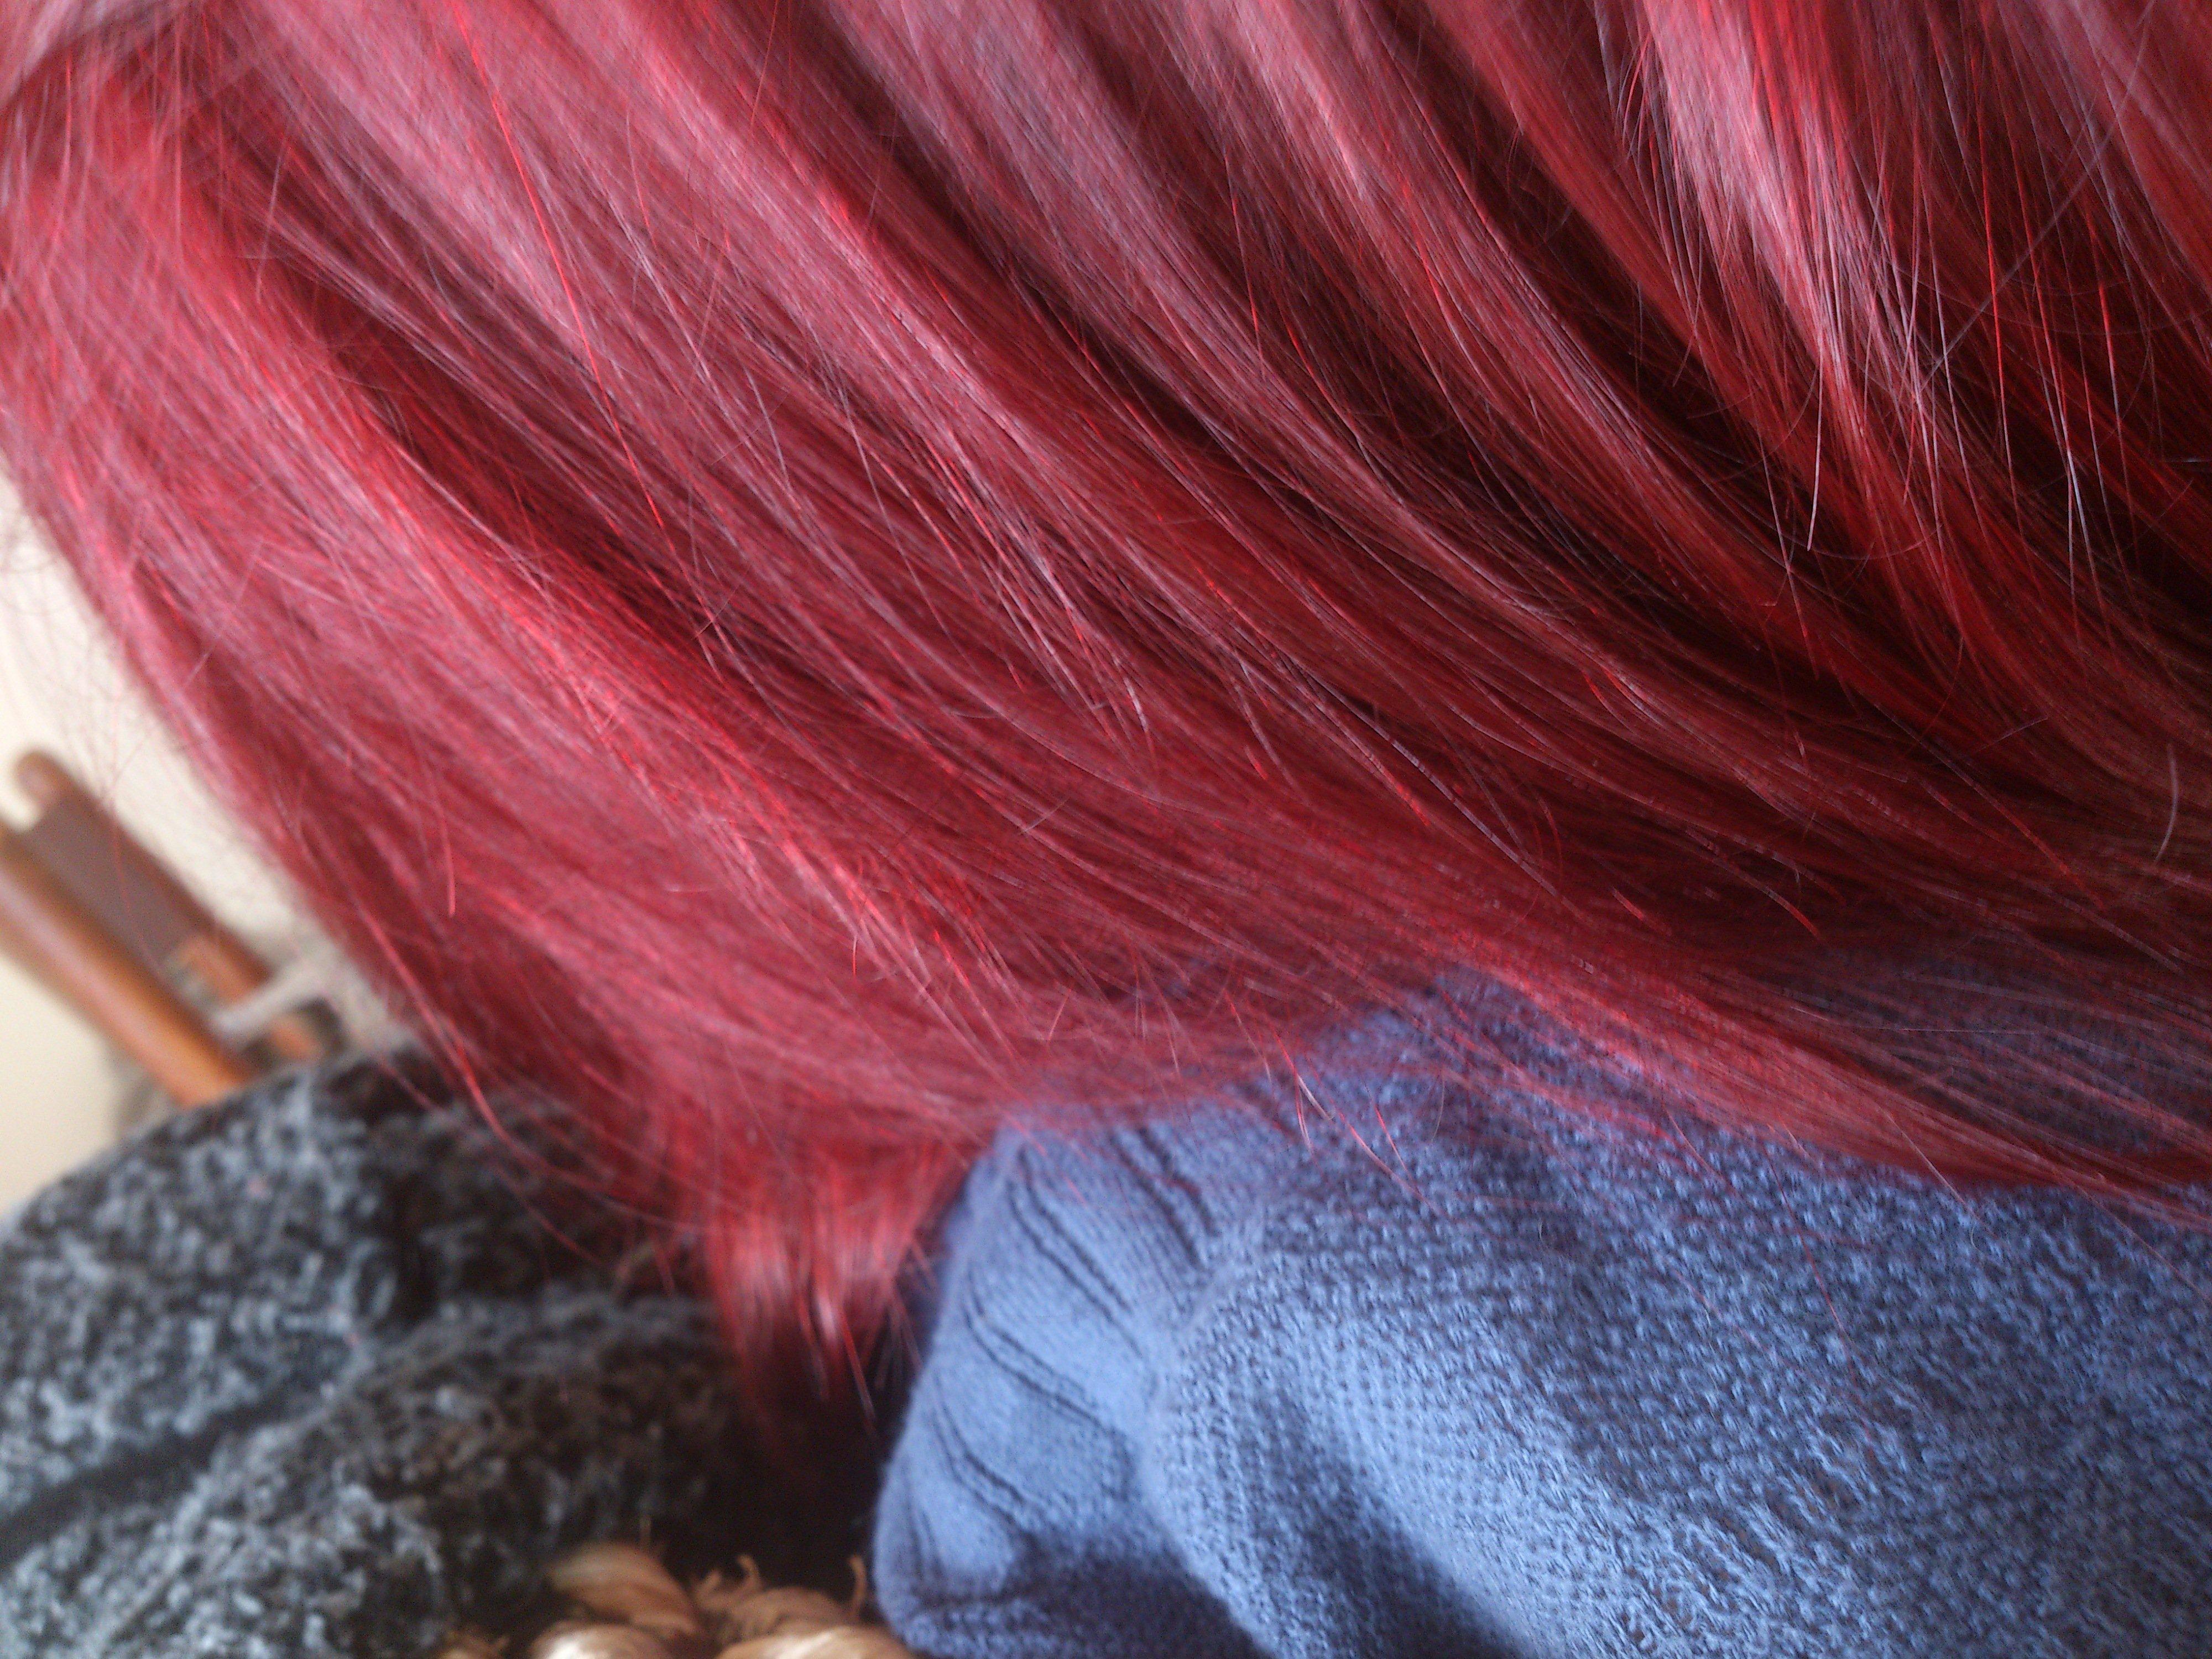 couleur cheveux framboise trendy coloration cheveux rouge with couleur cheveux framboise. Black Bedroom Furniture Sets. Home Design Ideas